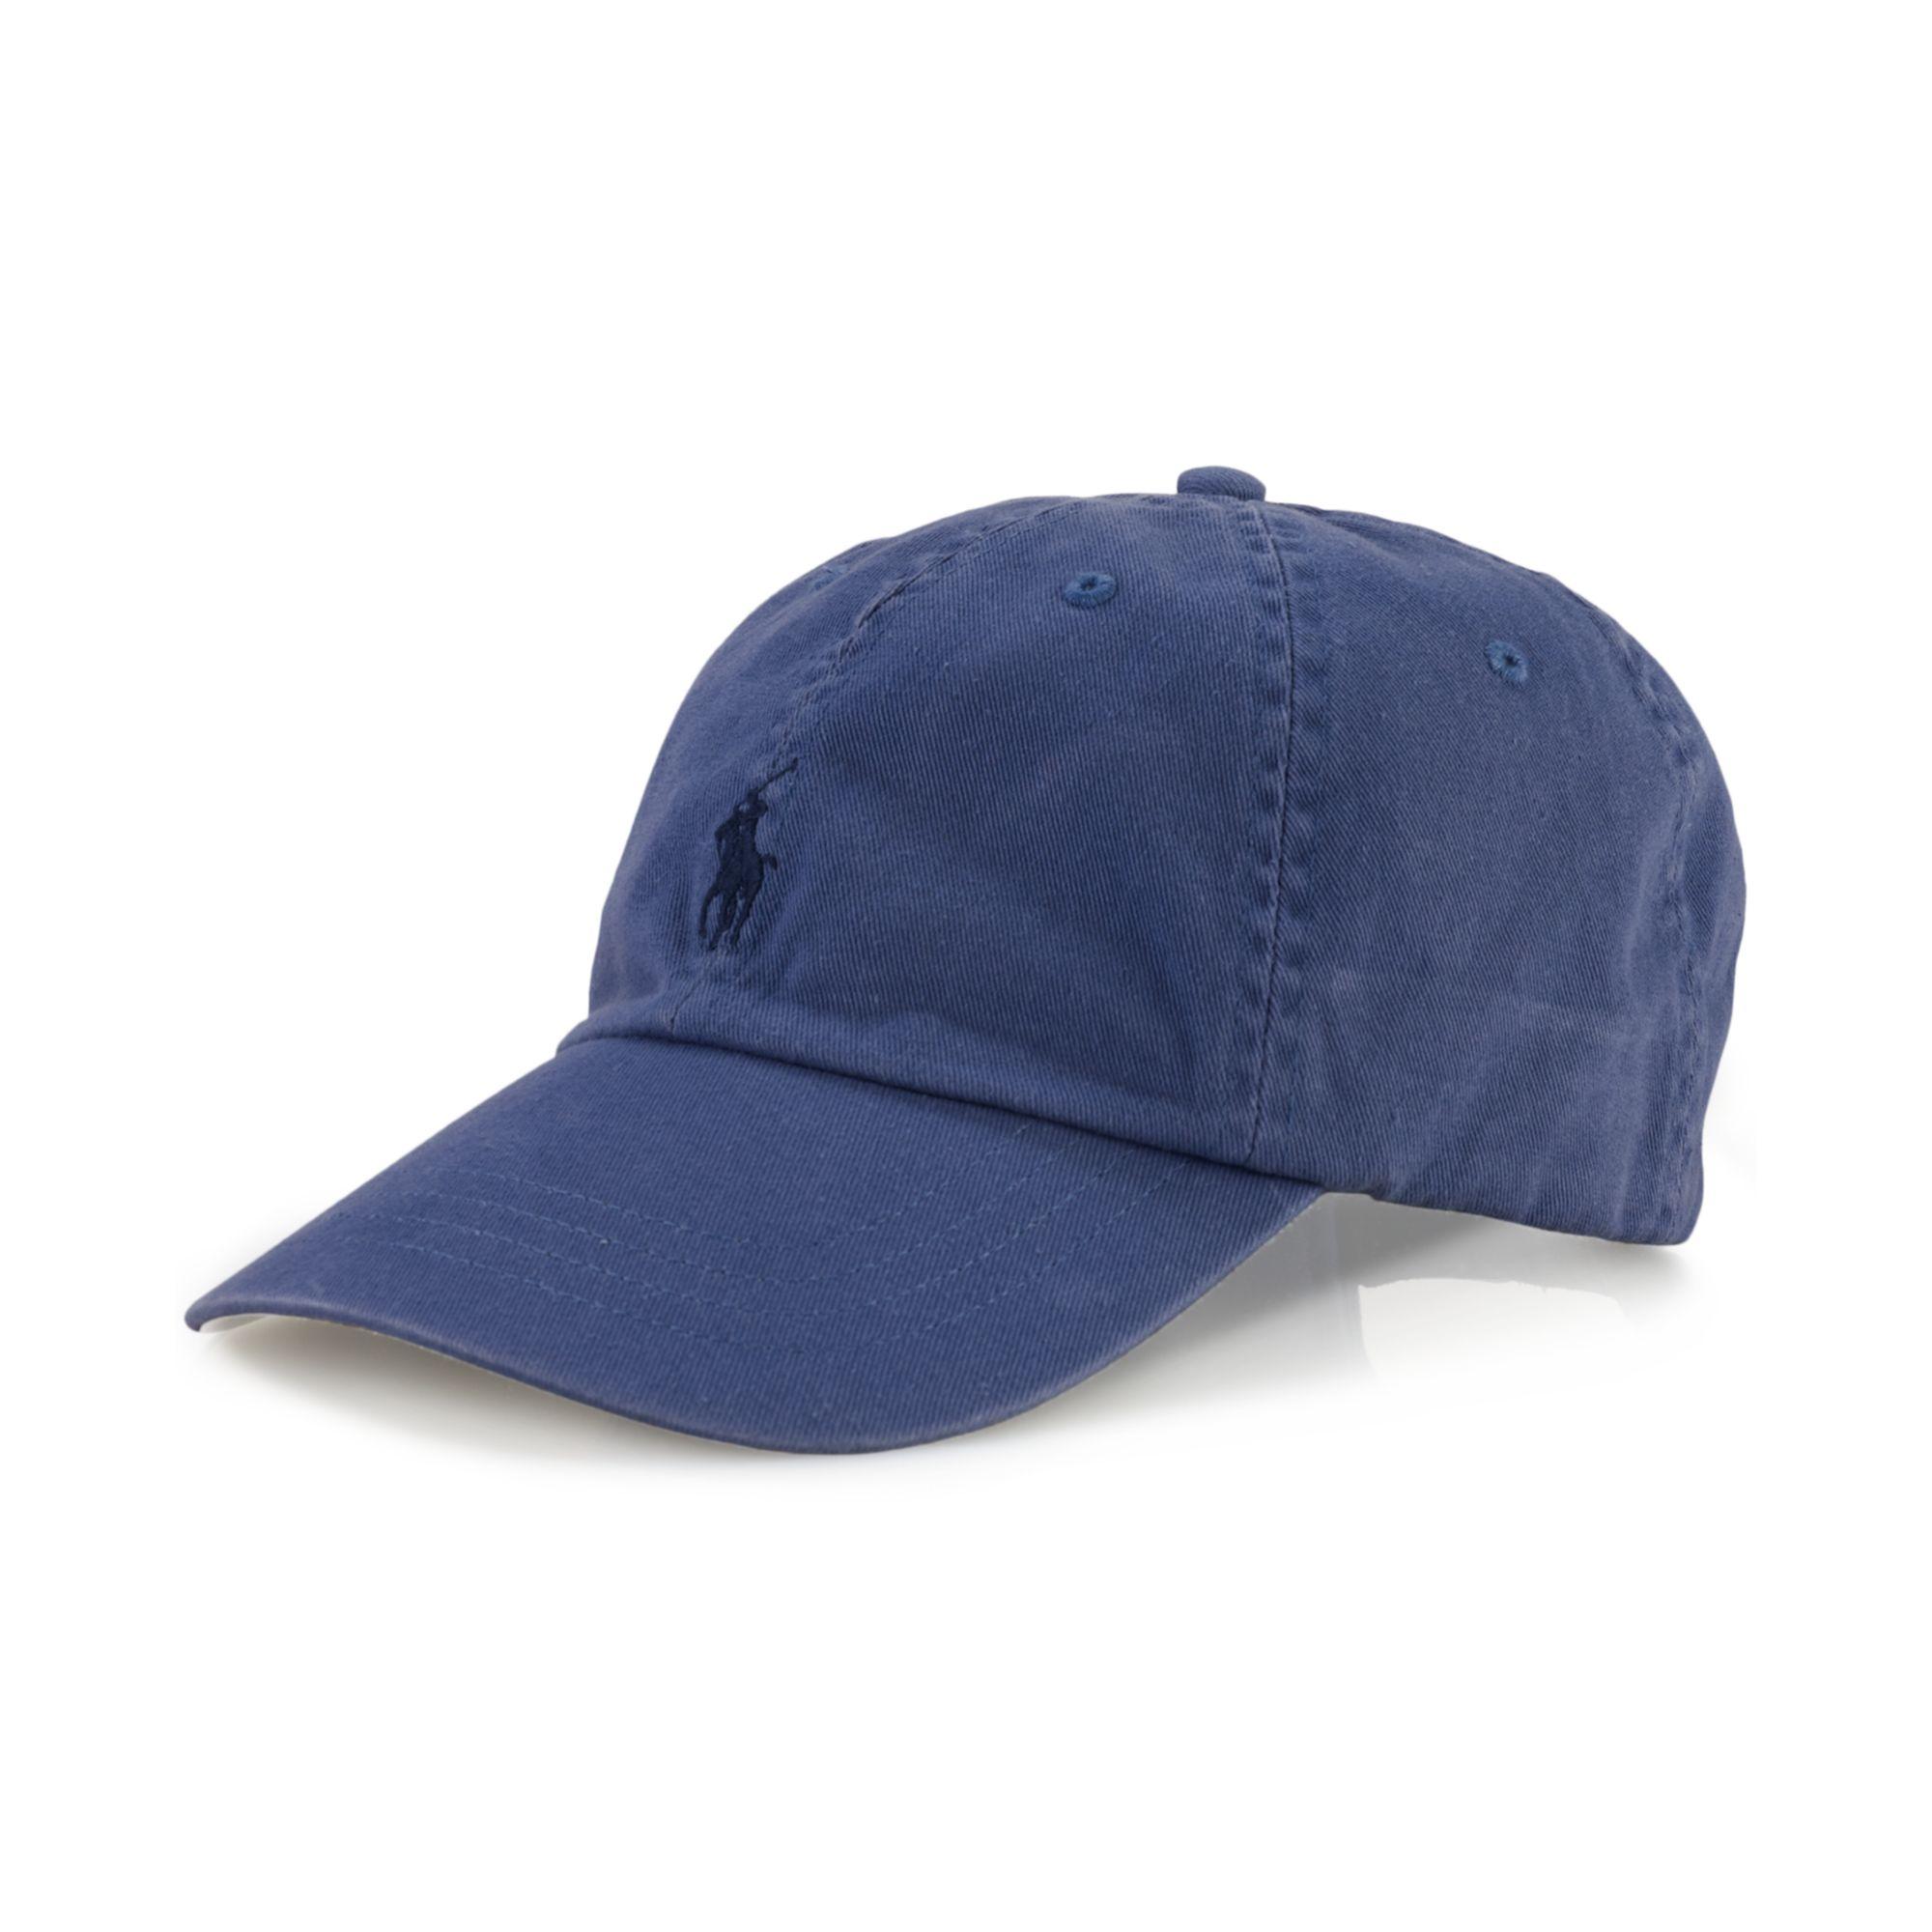 polo ralph lauren core classic sport cap in blue for men carson blue. Black Bedroom Furniture Sets. Home Design Ideas